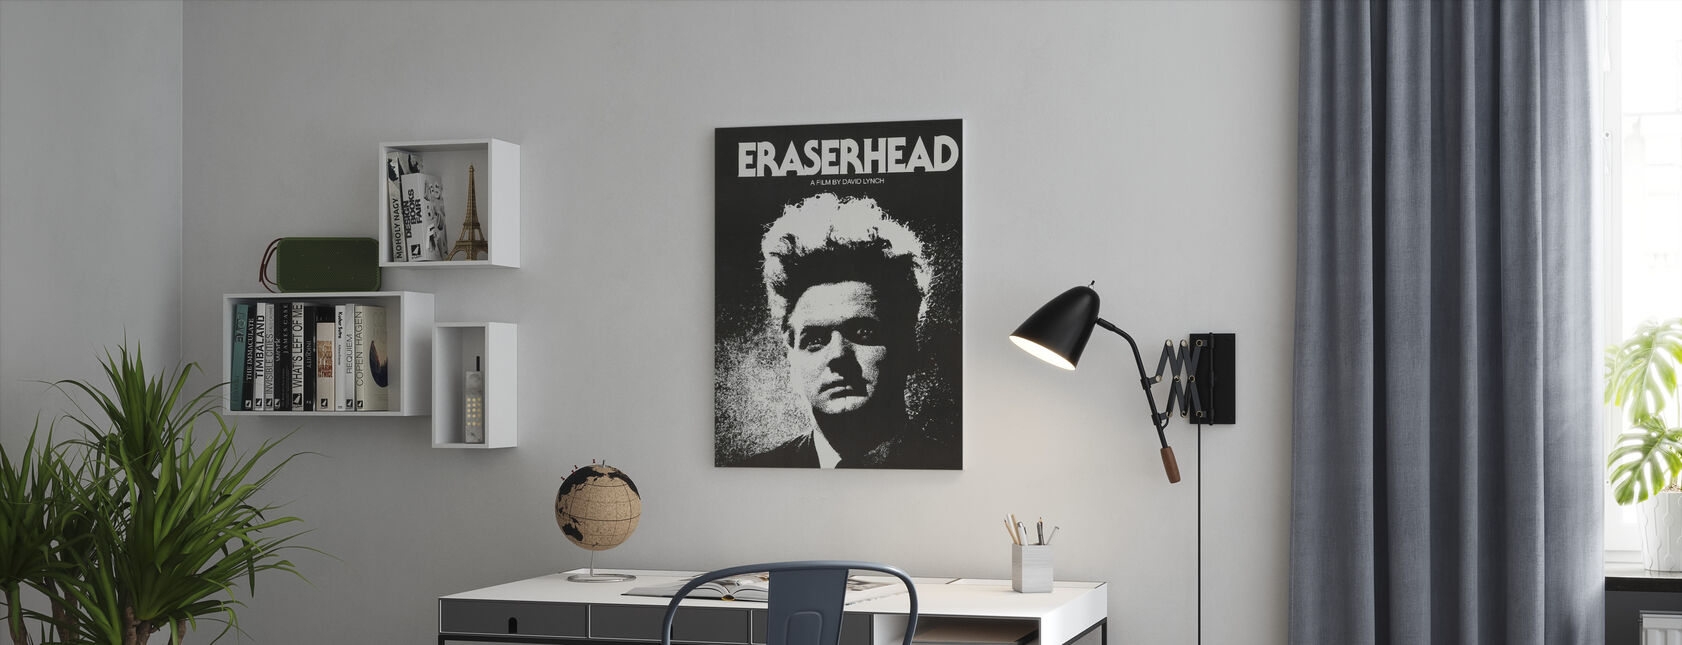 Eraserhead - Lerretsbilde - Kontor